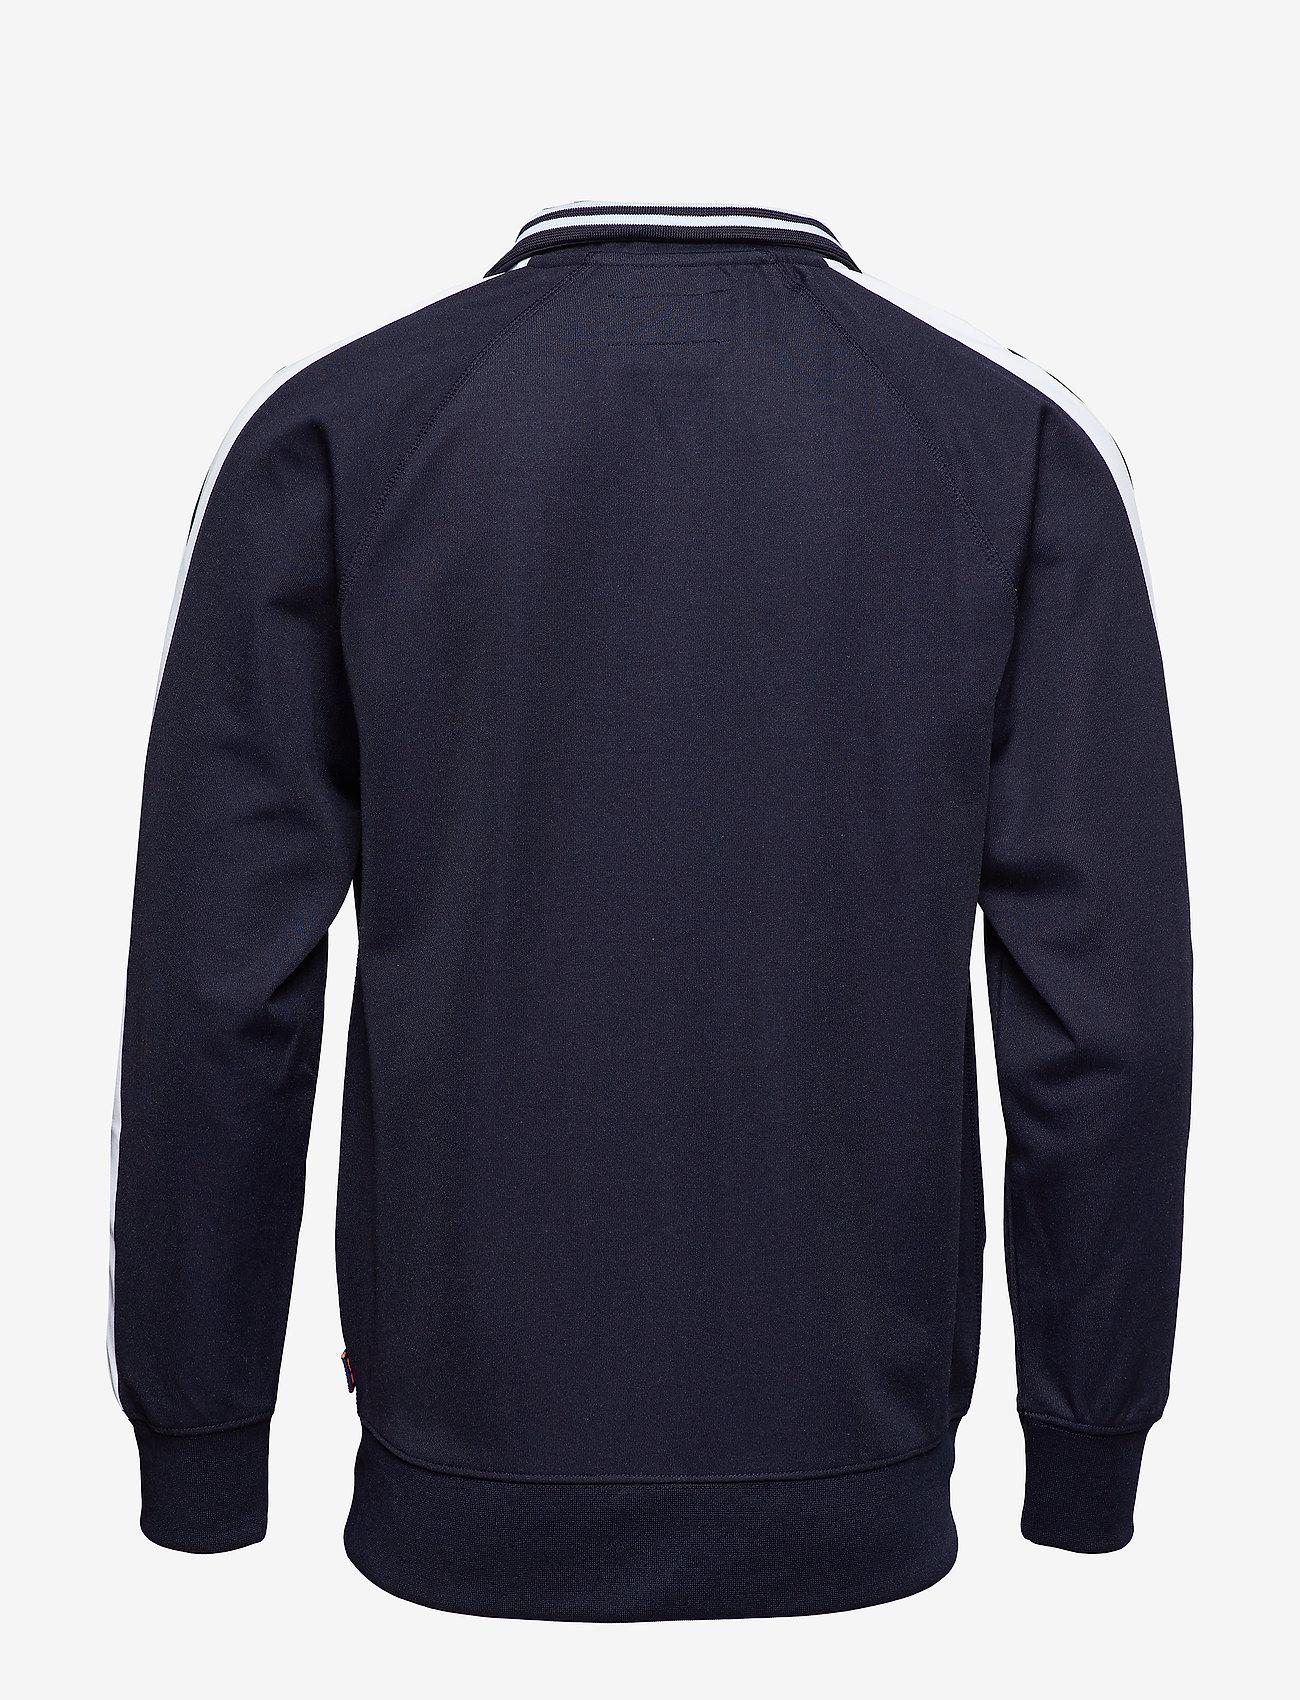 Superdry - LINEMAN SLIM FIT TRACK TOP - track jackets - track navy/optic - 1